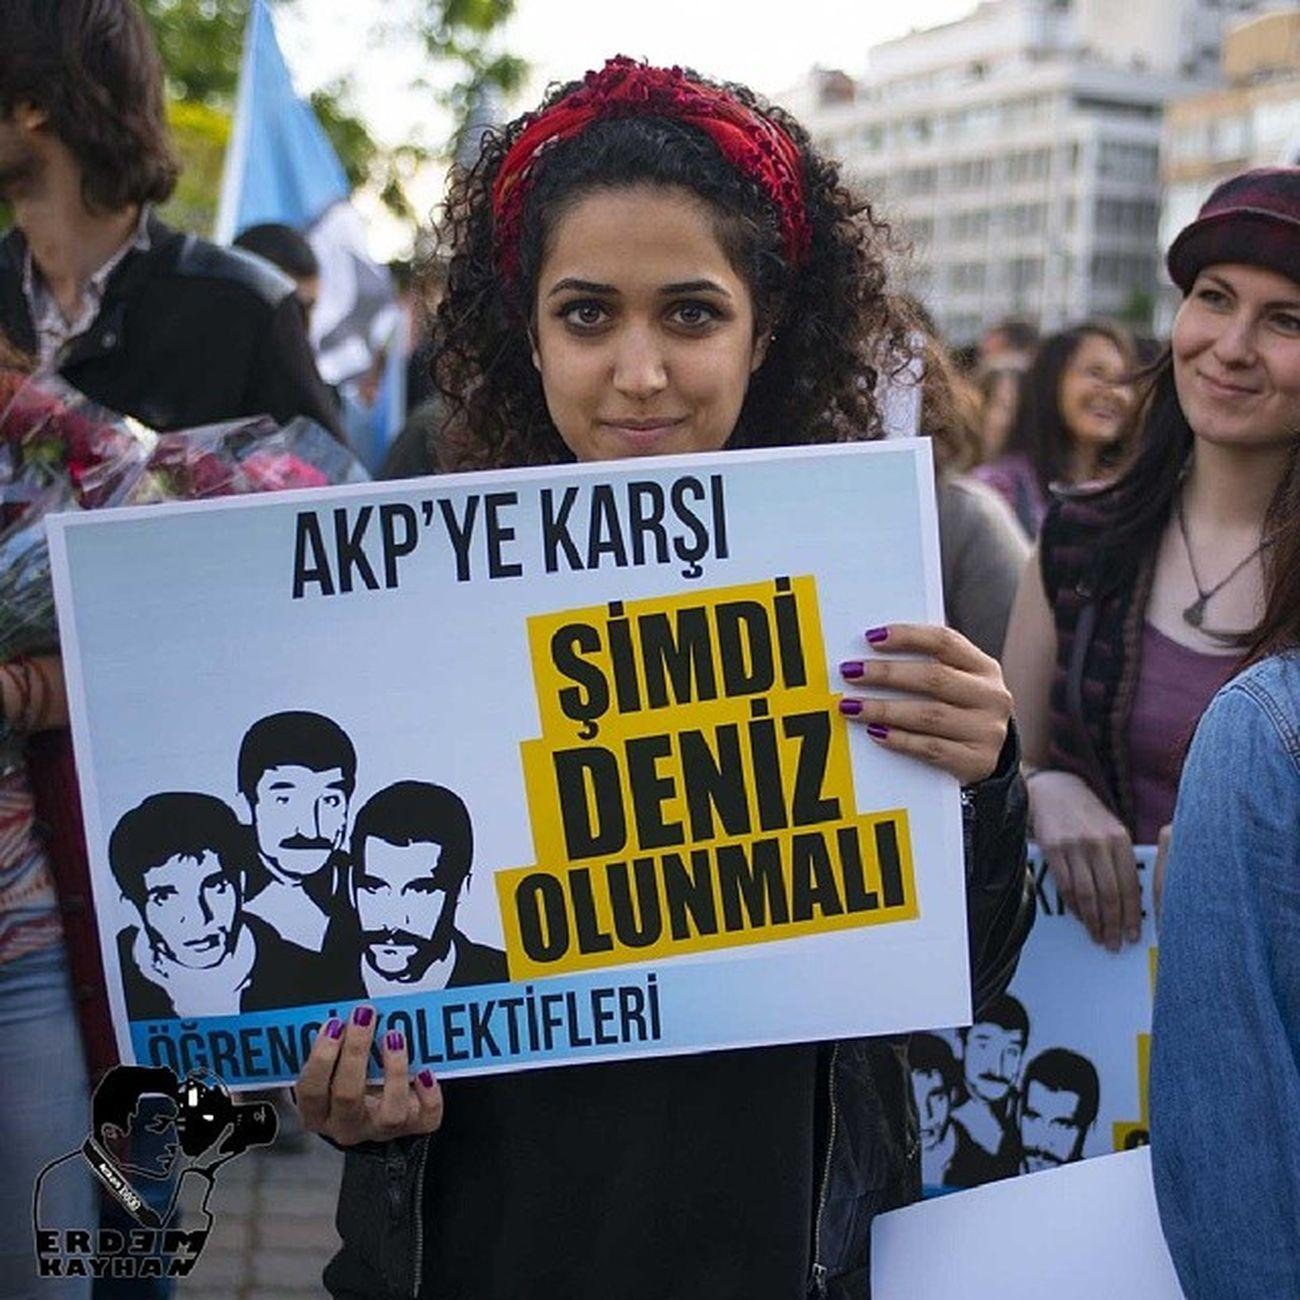 Ezgi Denizler 3Fidan Dolmabahçe protest goverment anticapital marxist yemeni curly antiakp proleters